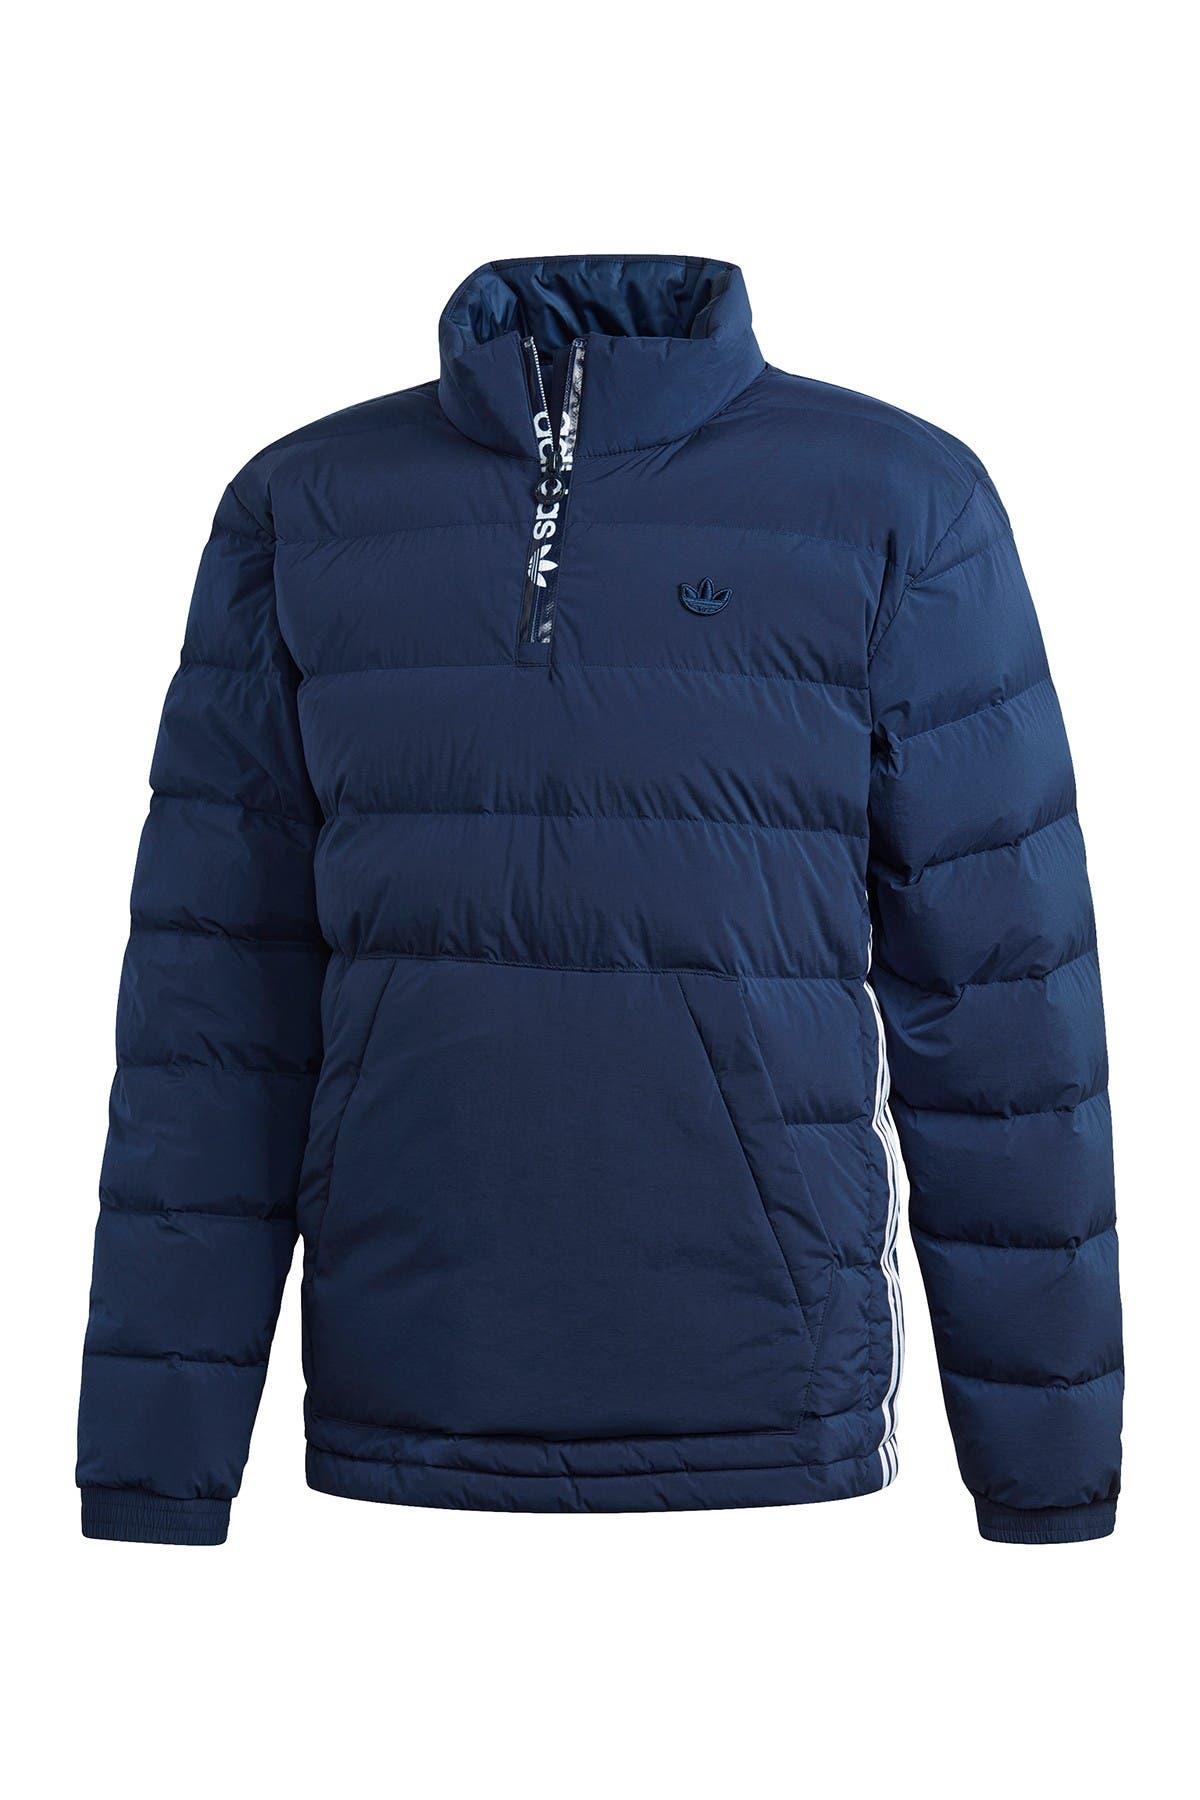 Image of adidas Lightweight Down Puffer Jacket